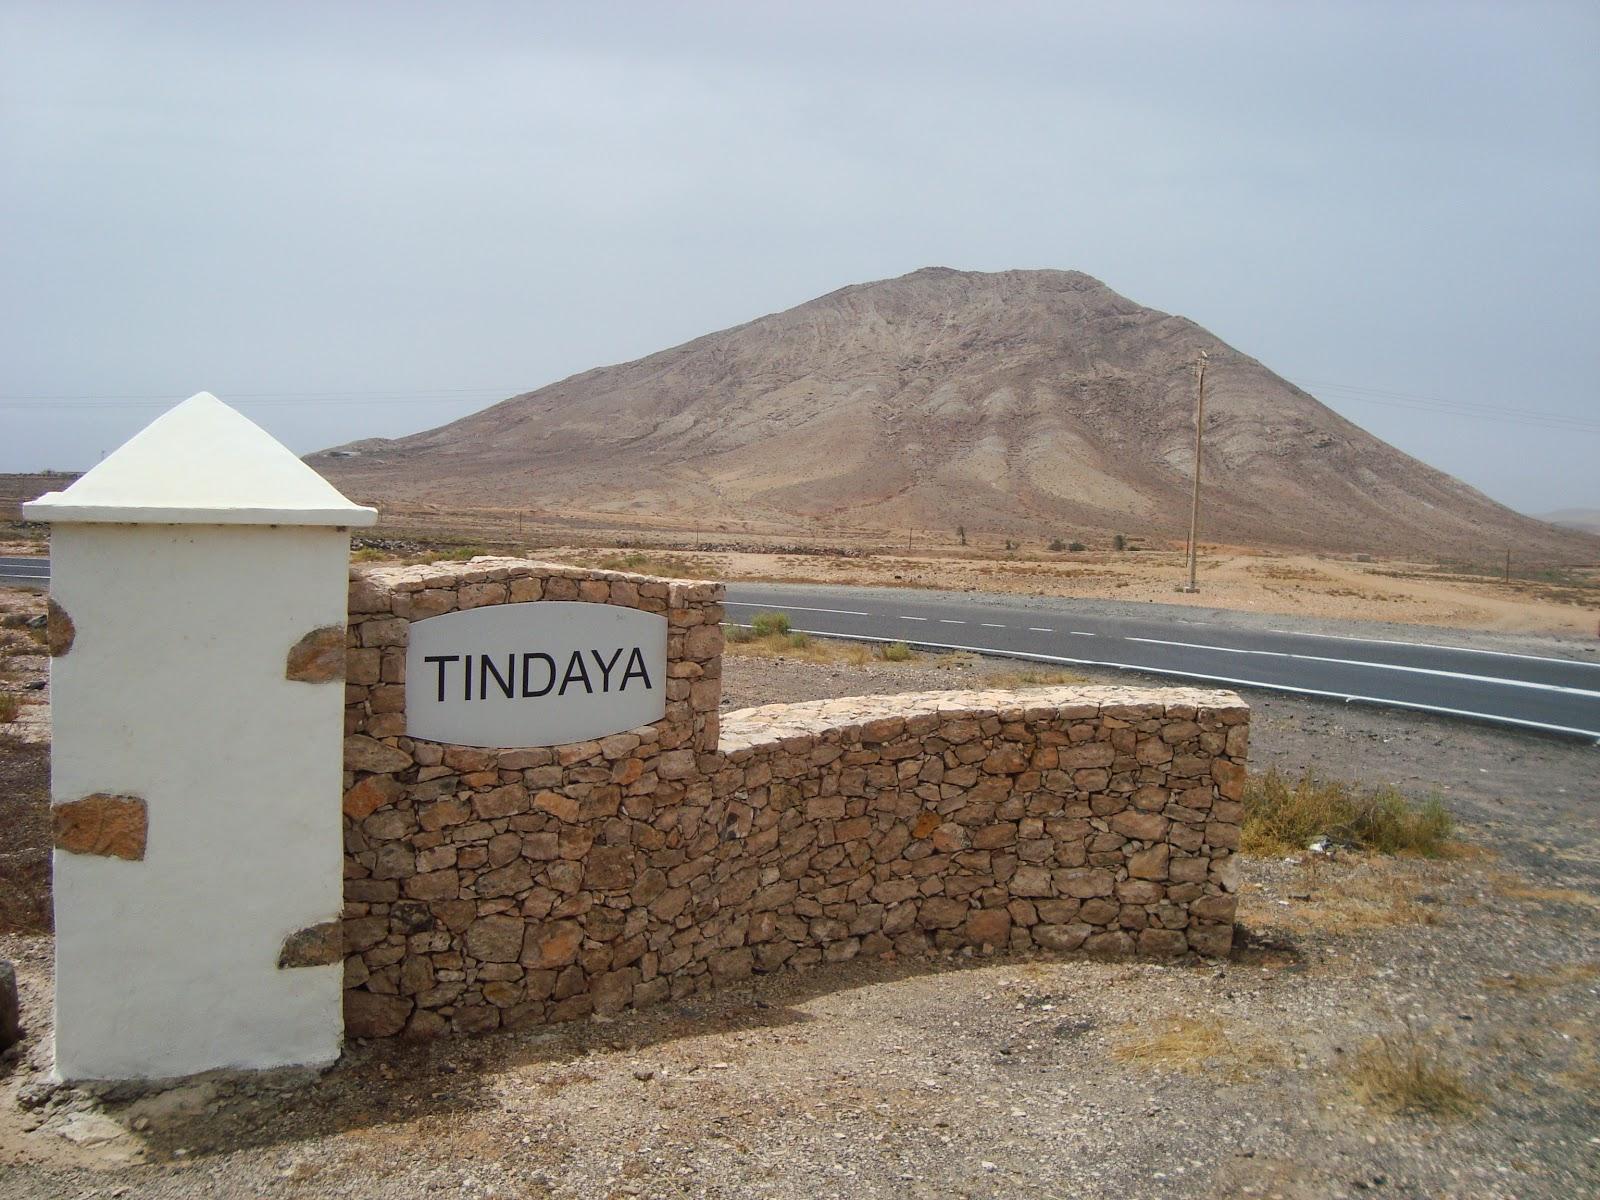 Montaña de Tindaya. Fuerteventura